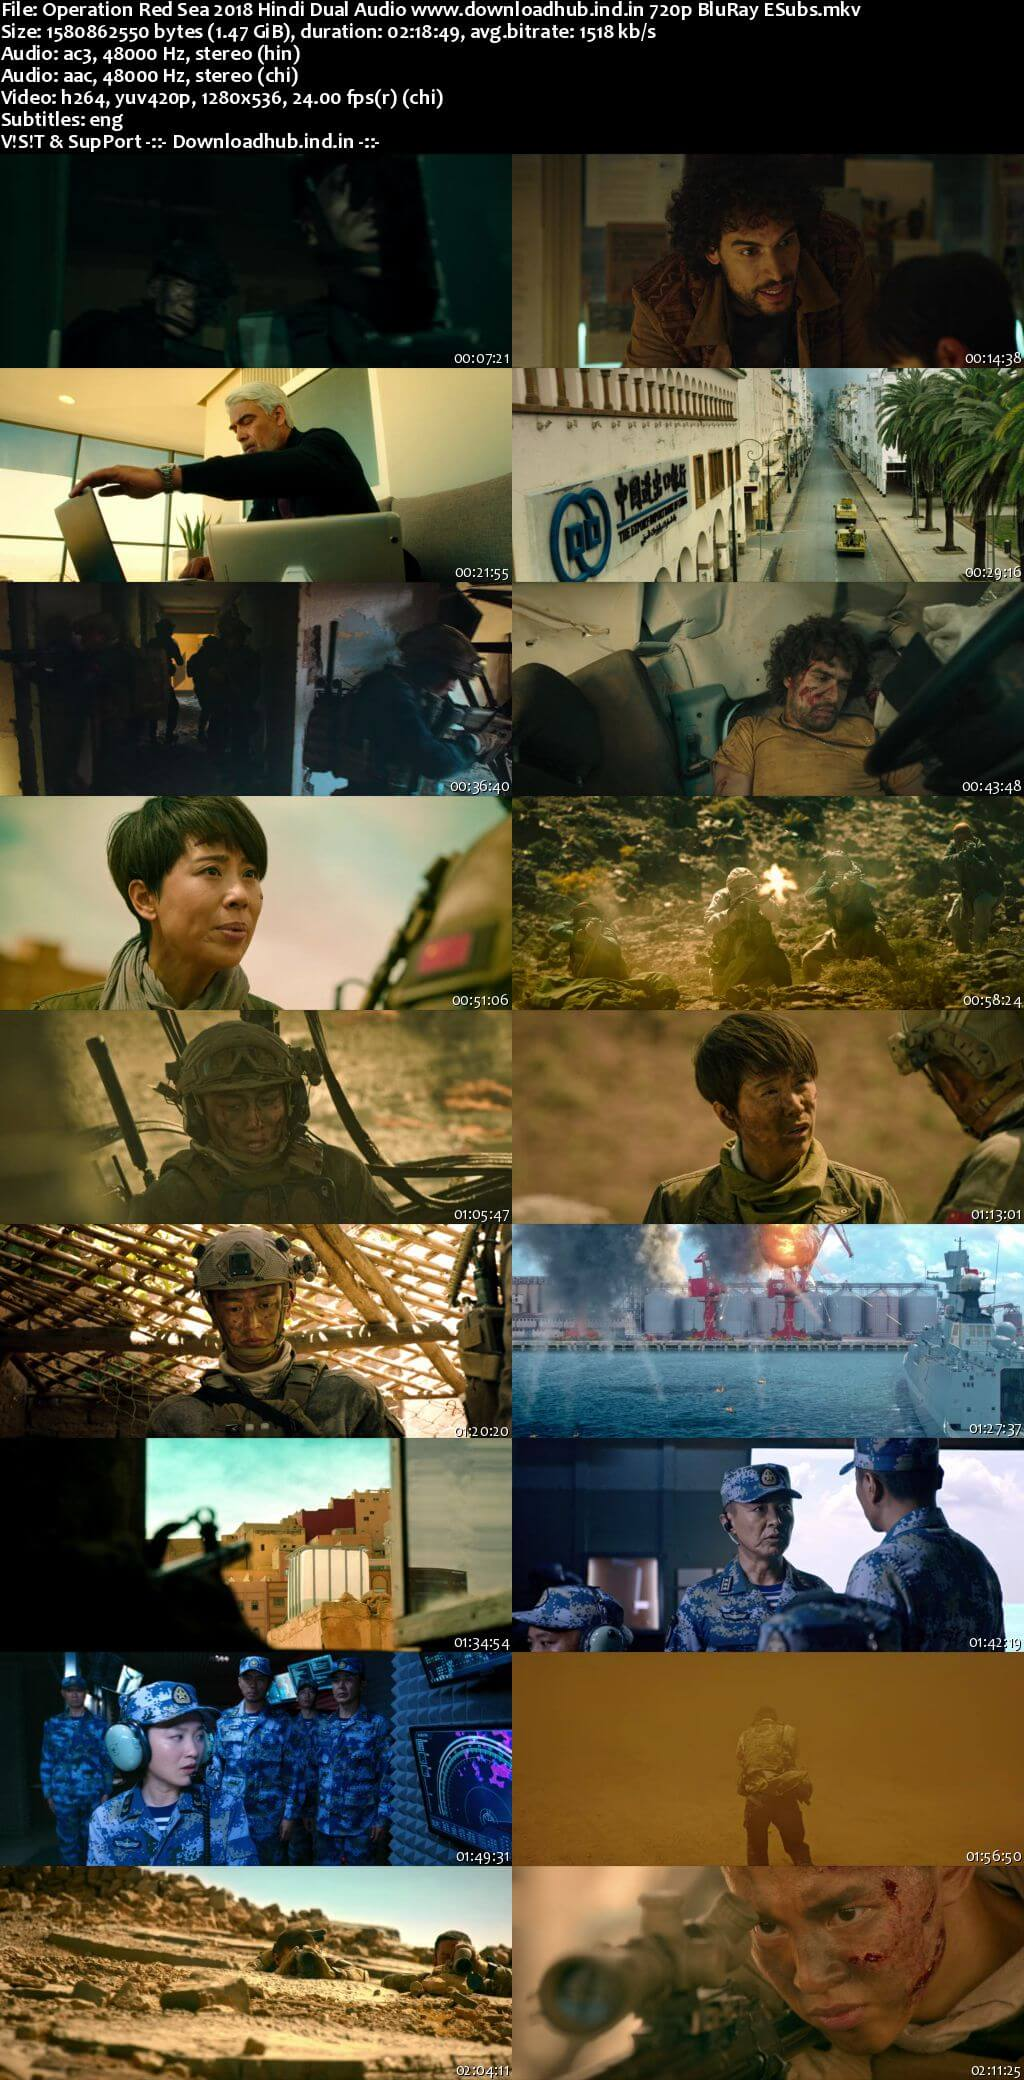 Operation Red Sea 2018 Hindi Dual Audio 720p BluRay ESubs